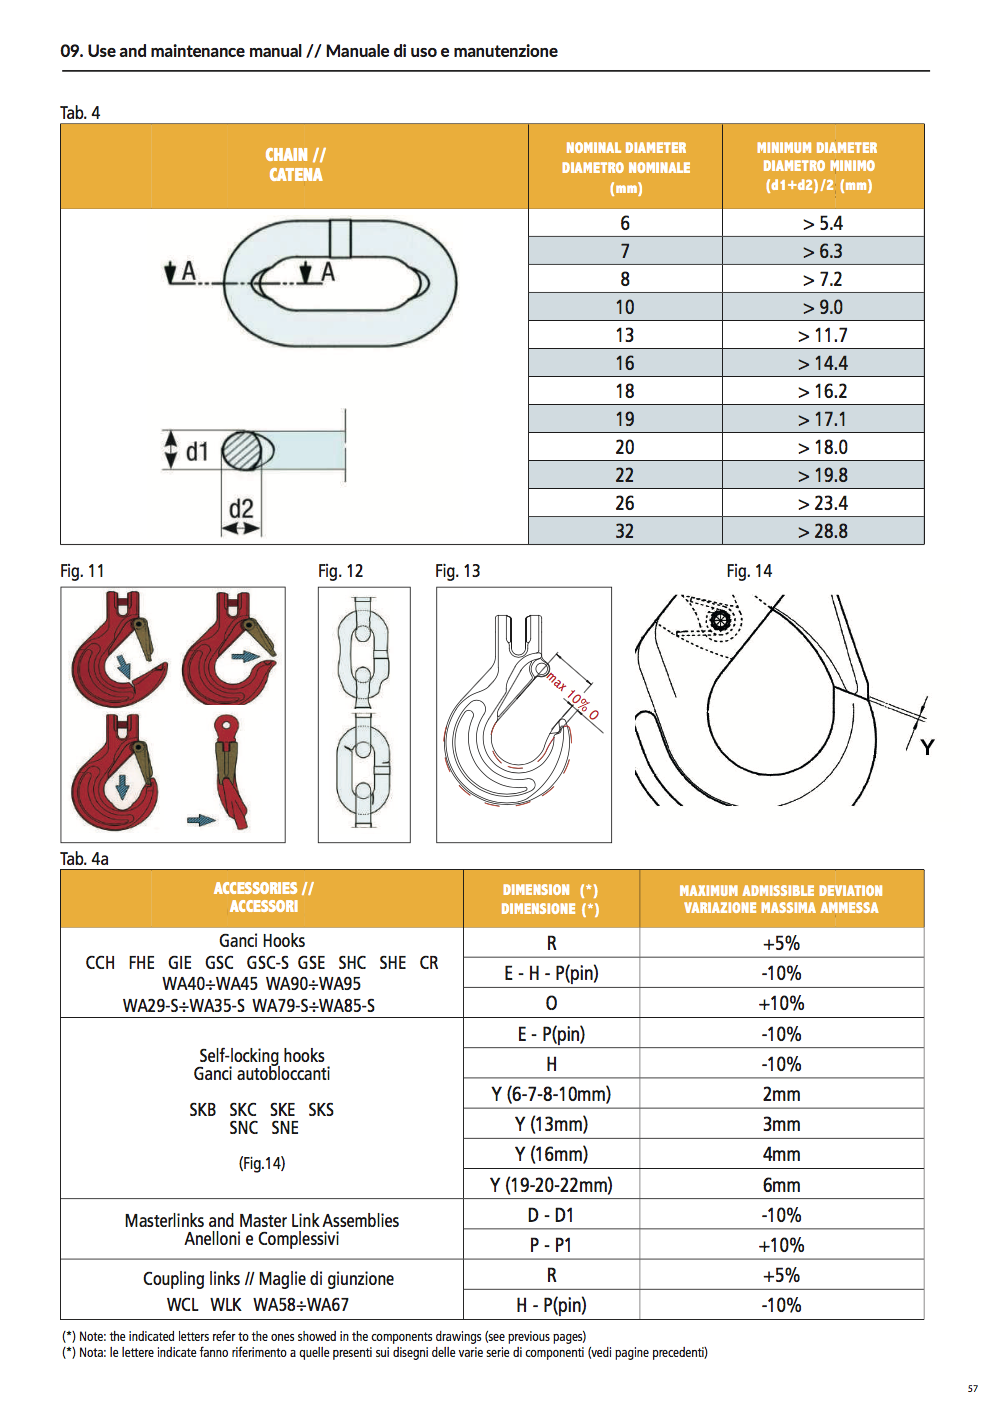 Manuale-uso-pag6